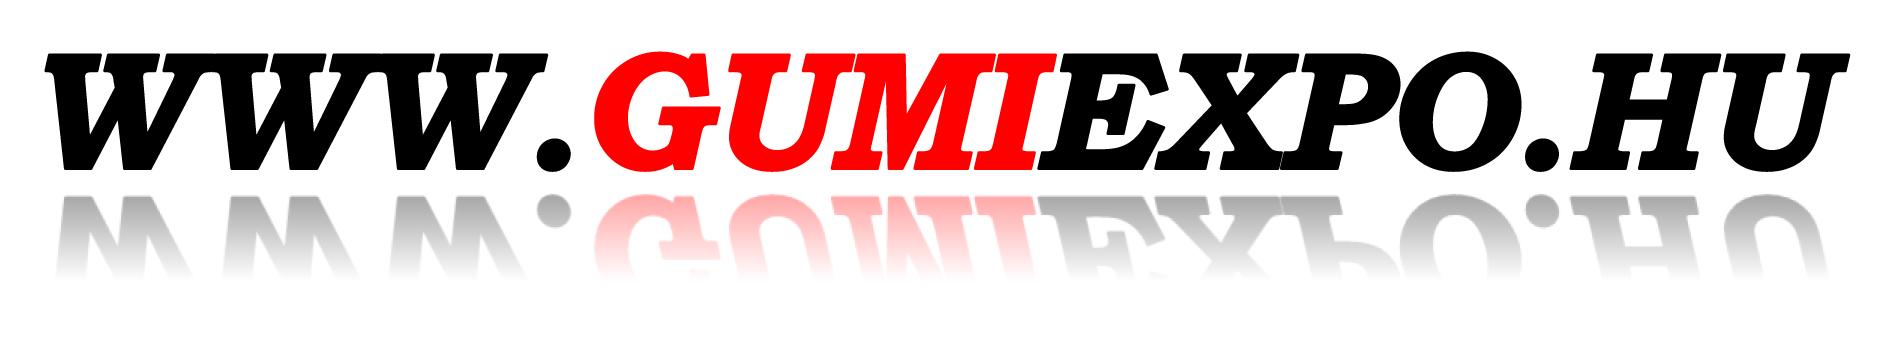 gumiexpo logo